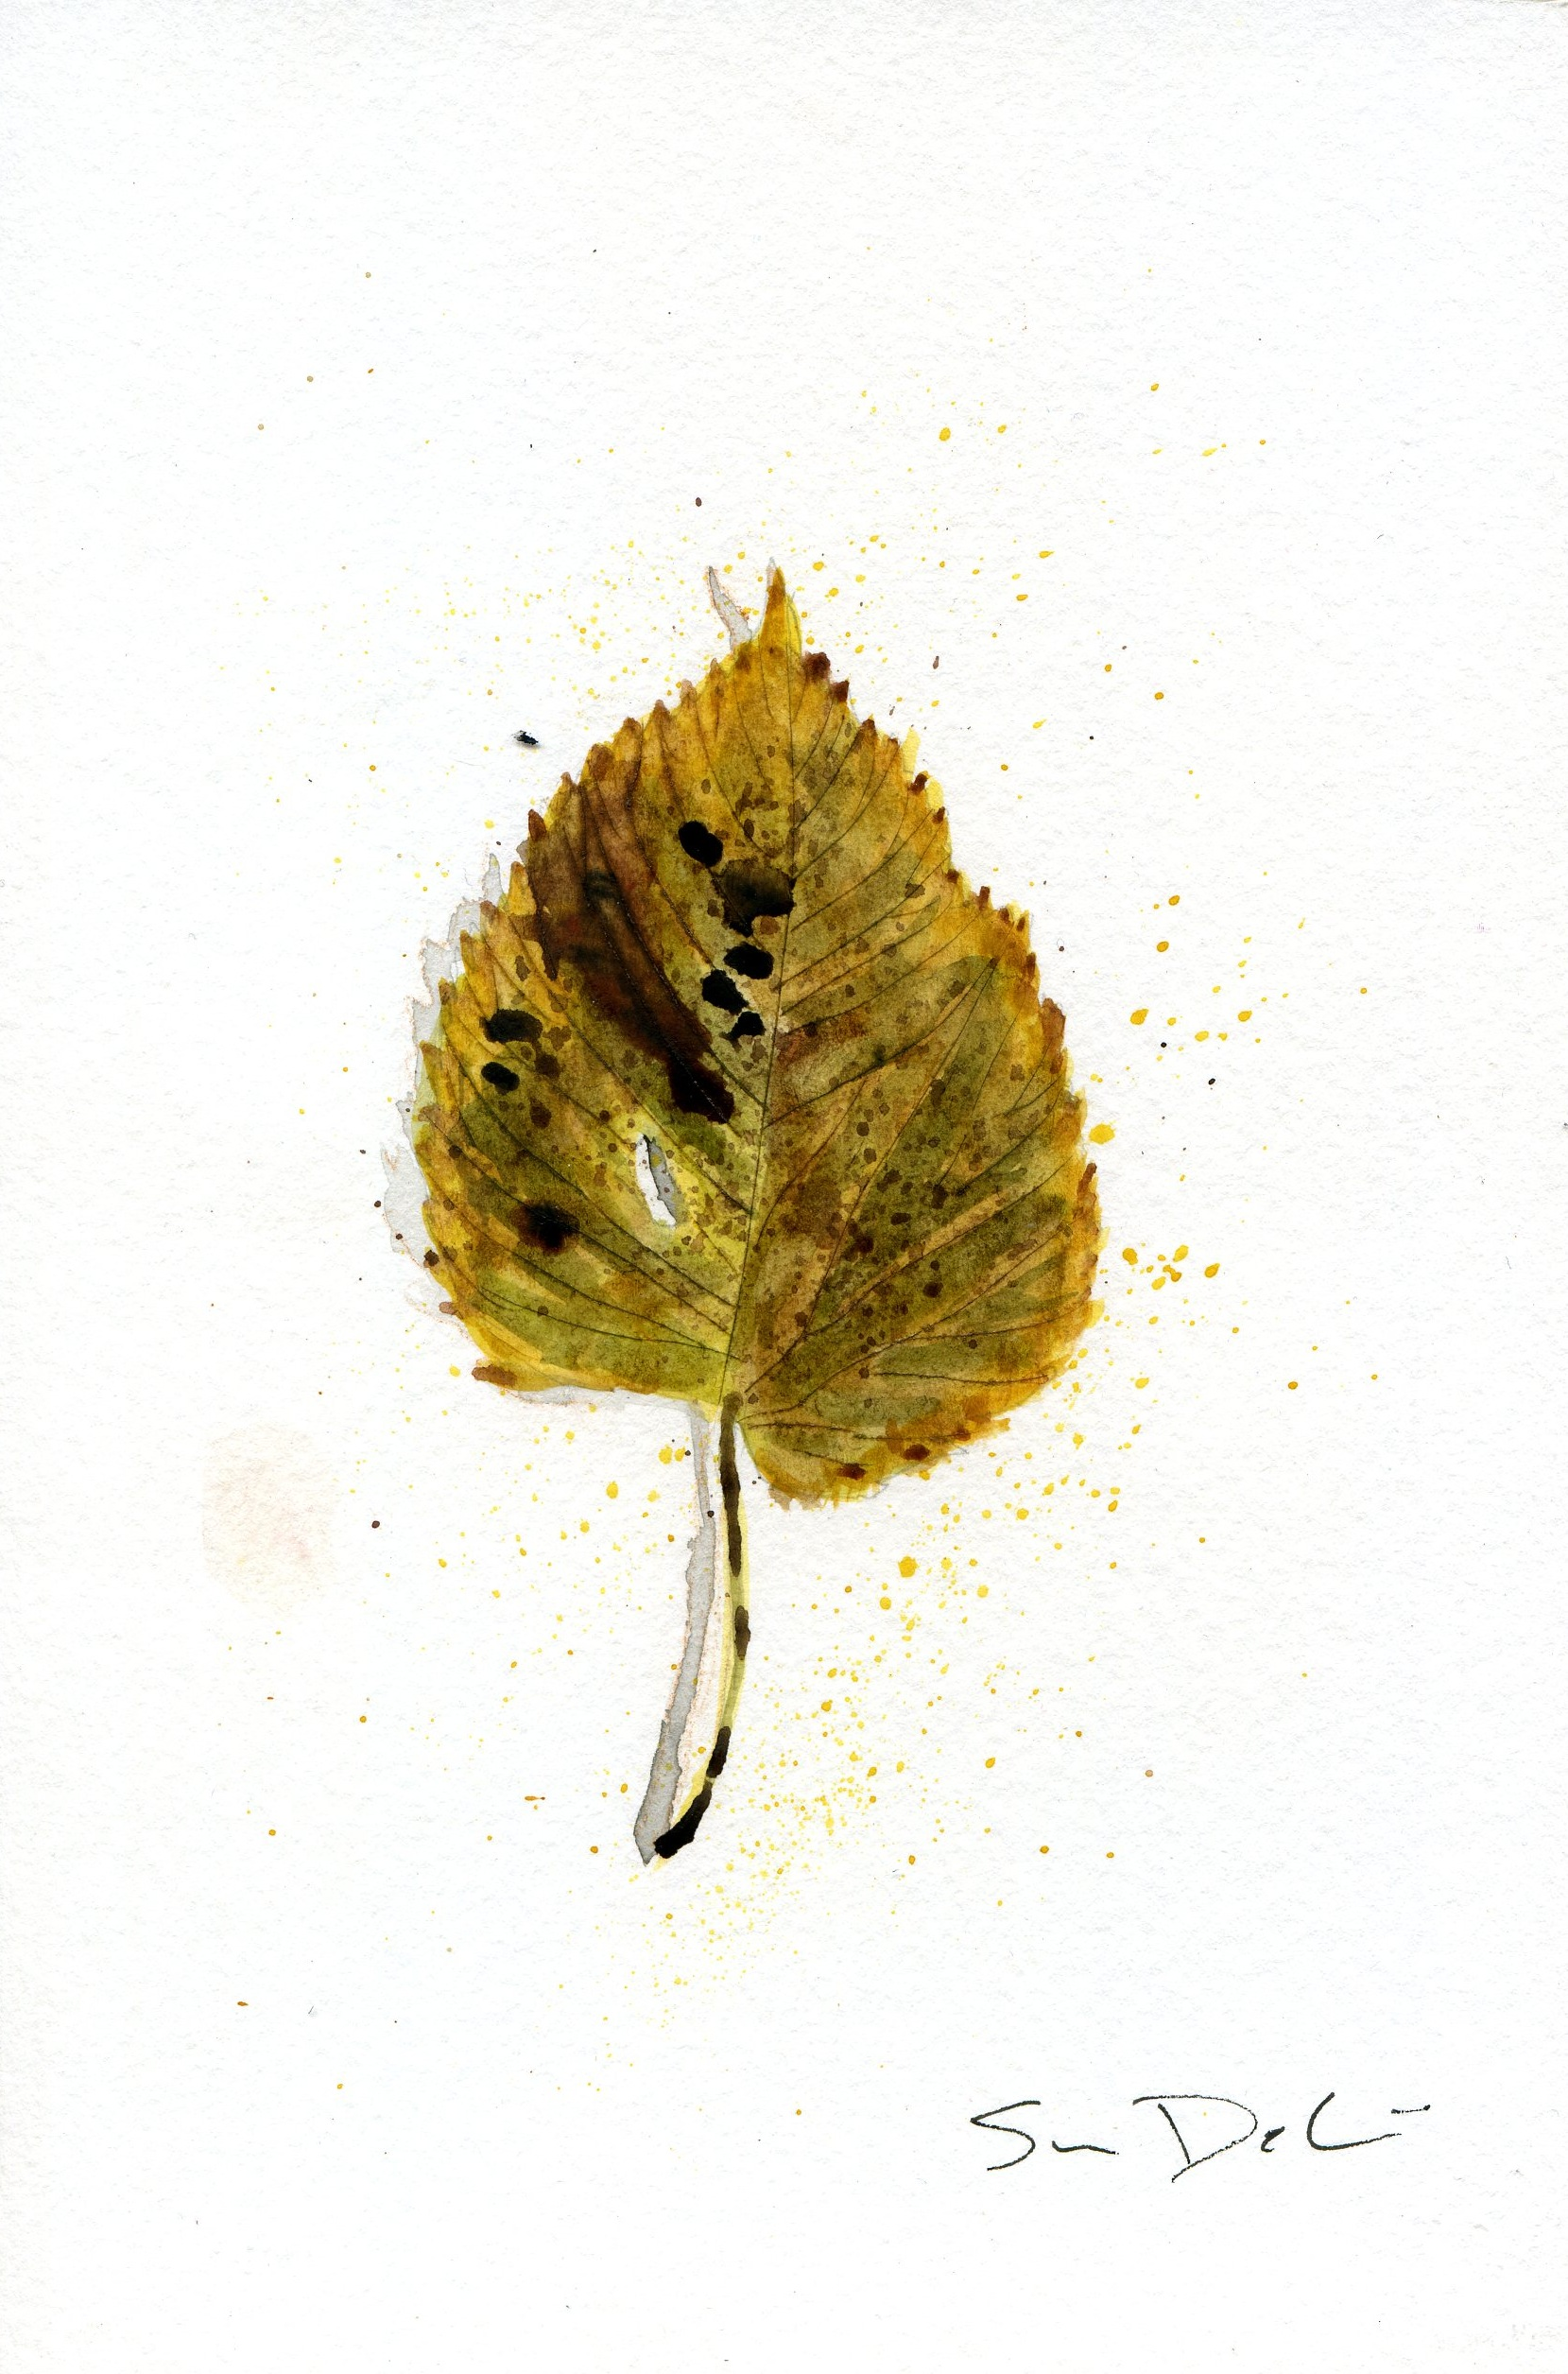 Birch Leaf Portrait 013 - SOLD